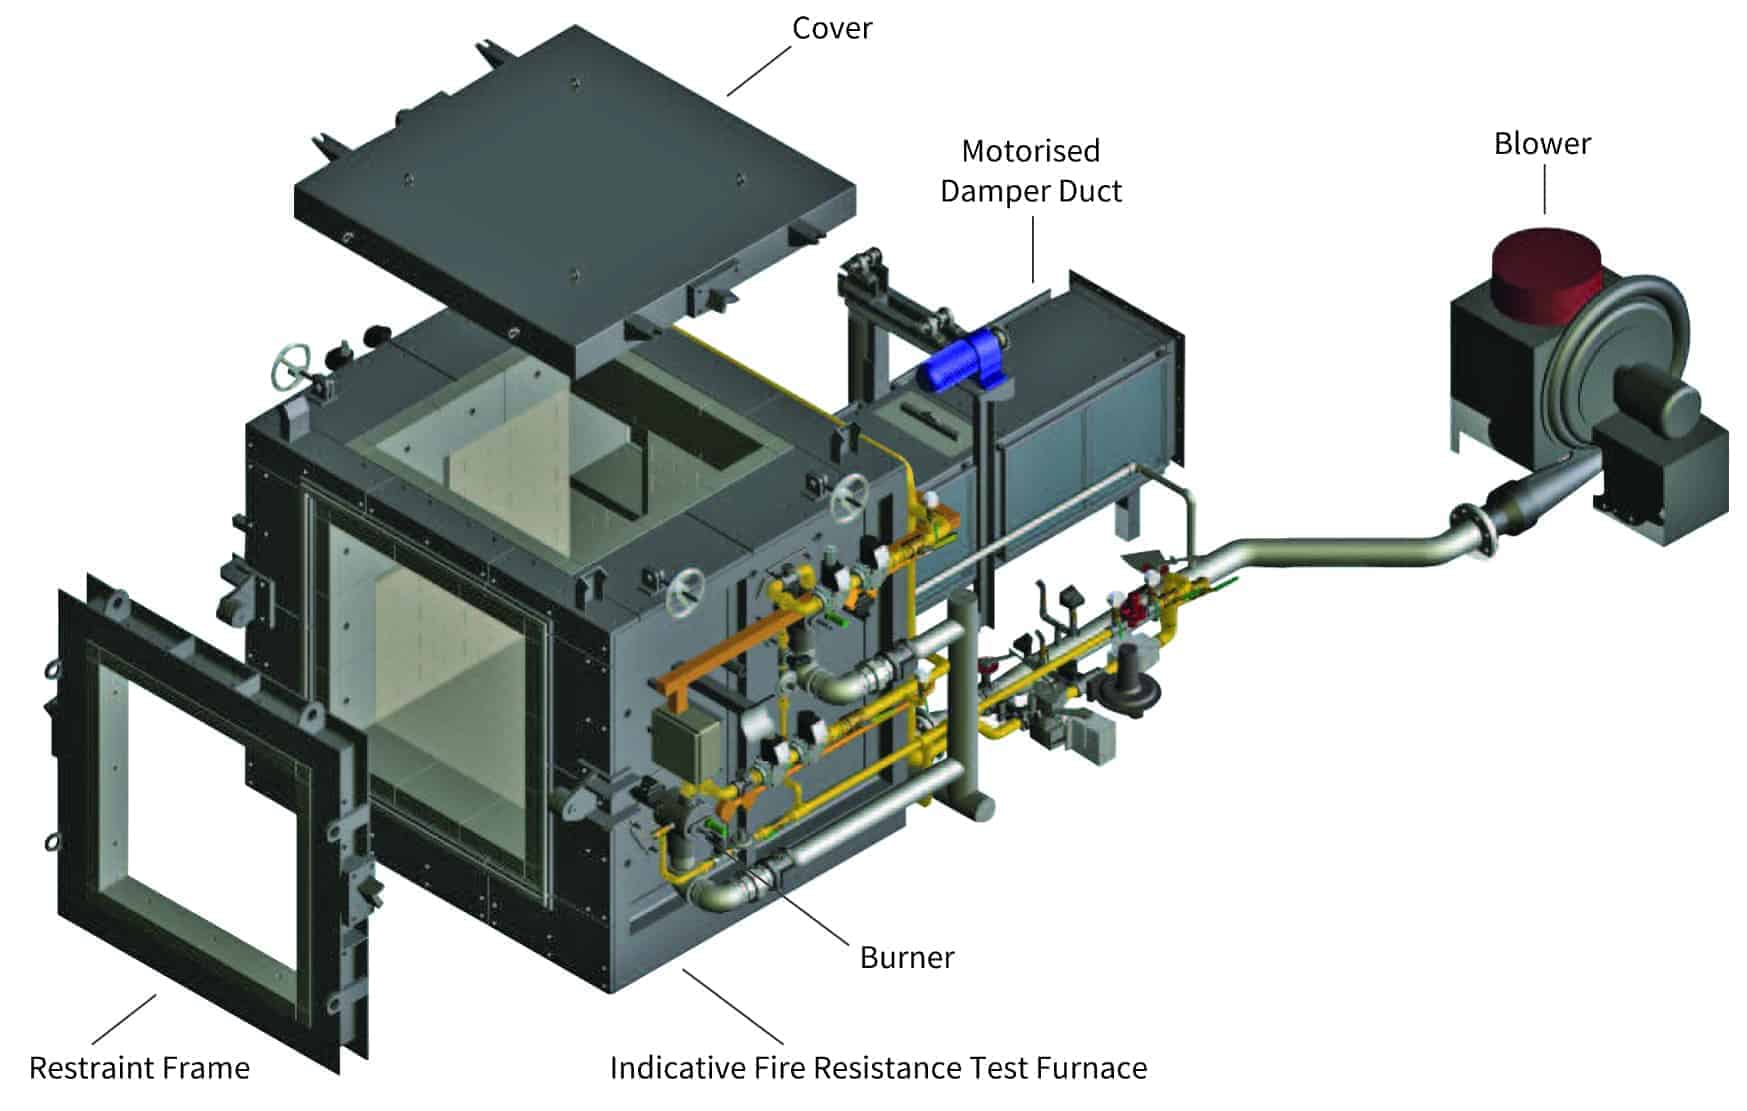 indicative fire resistance test furnace